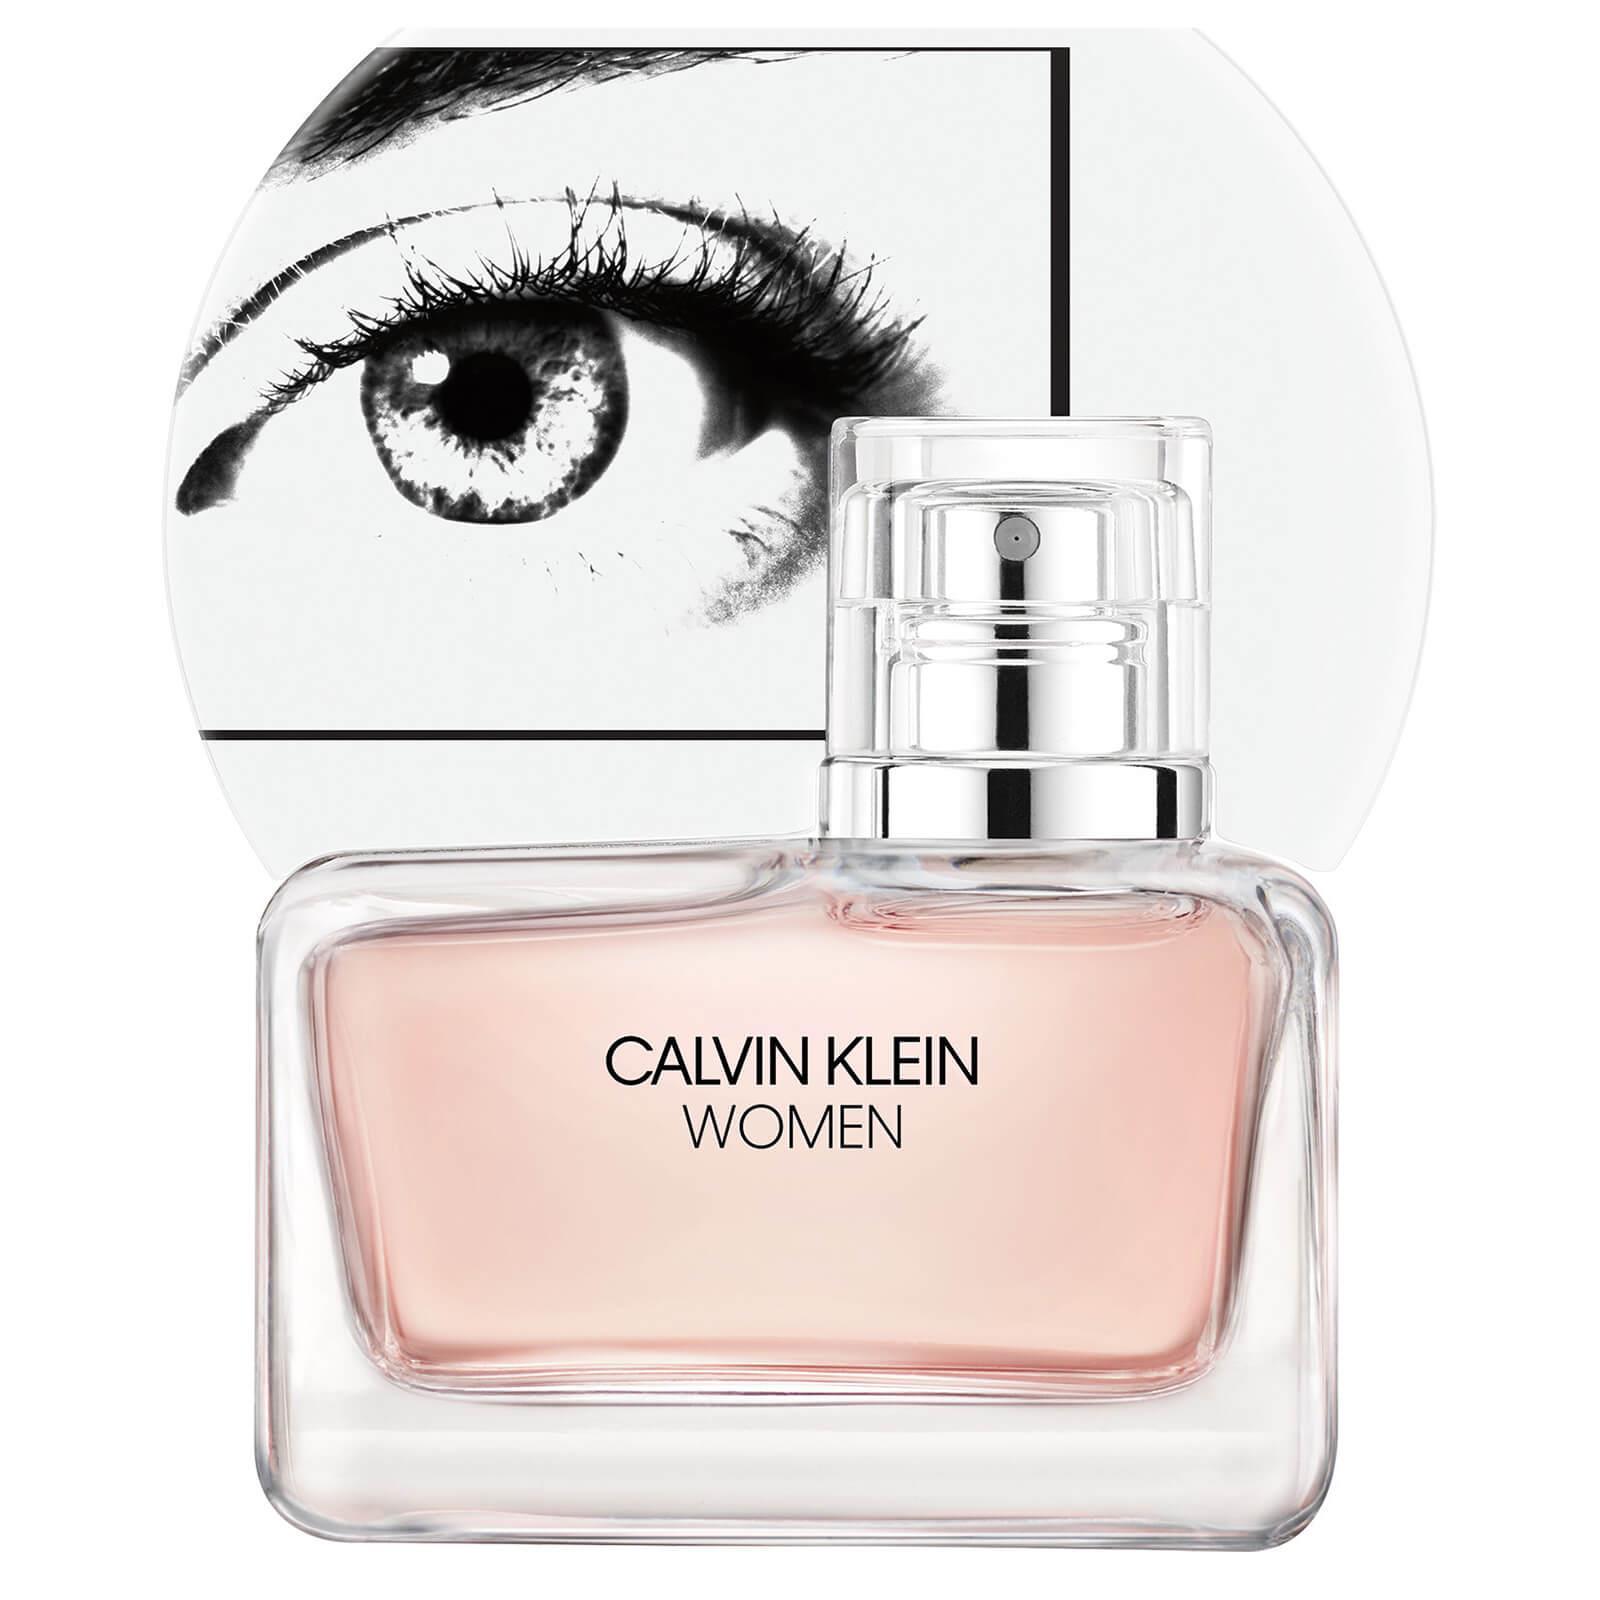 Perfume Calvin Klein Women. Perfume Women, de Calvin Klein